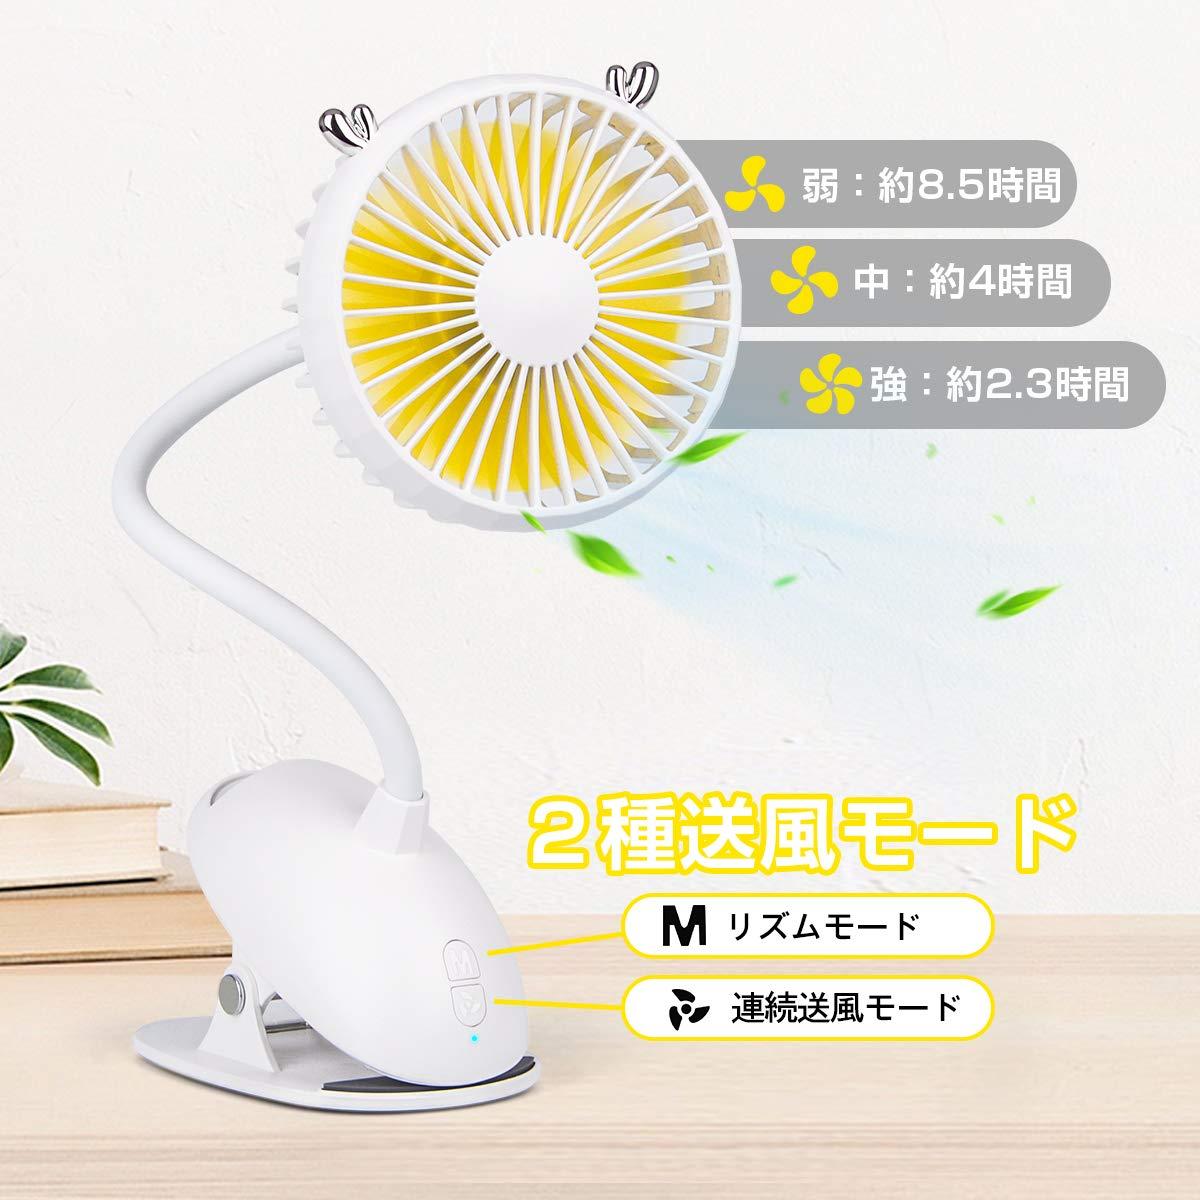 keynice携帯扇風機usbミニ充電式8.5時間連続使用可能リズム風熱中症対策グッズ送料無料kn-1706j-wh